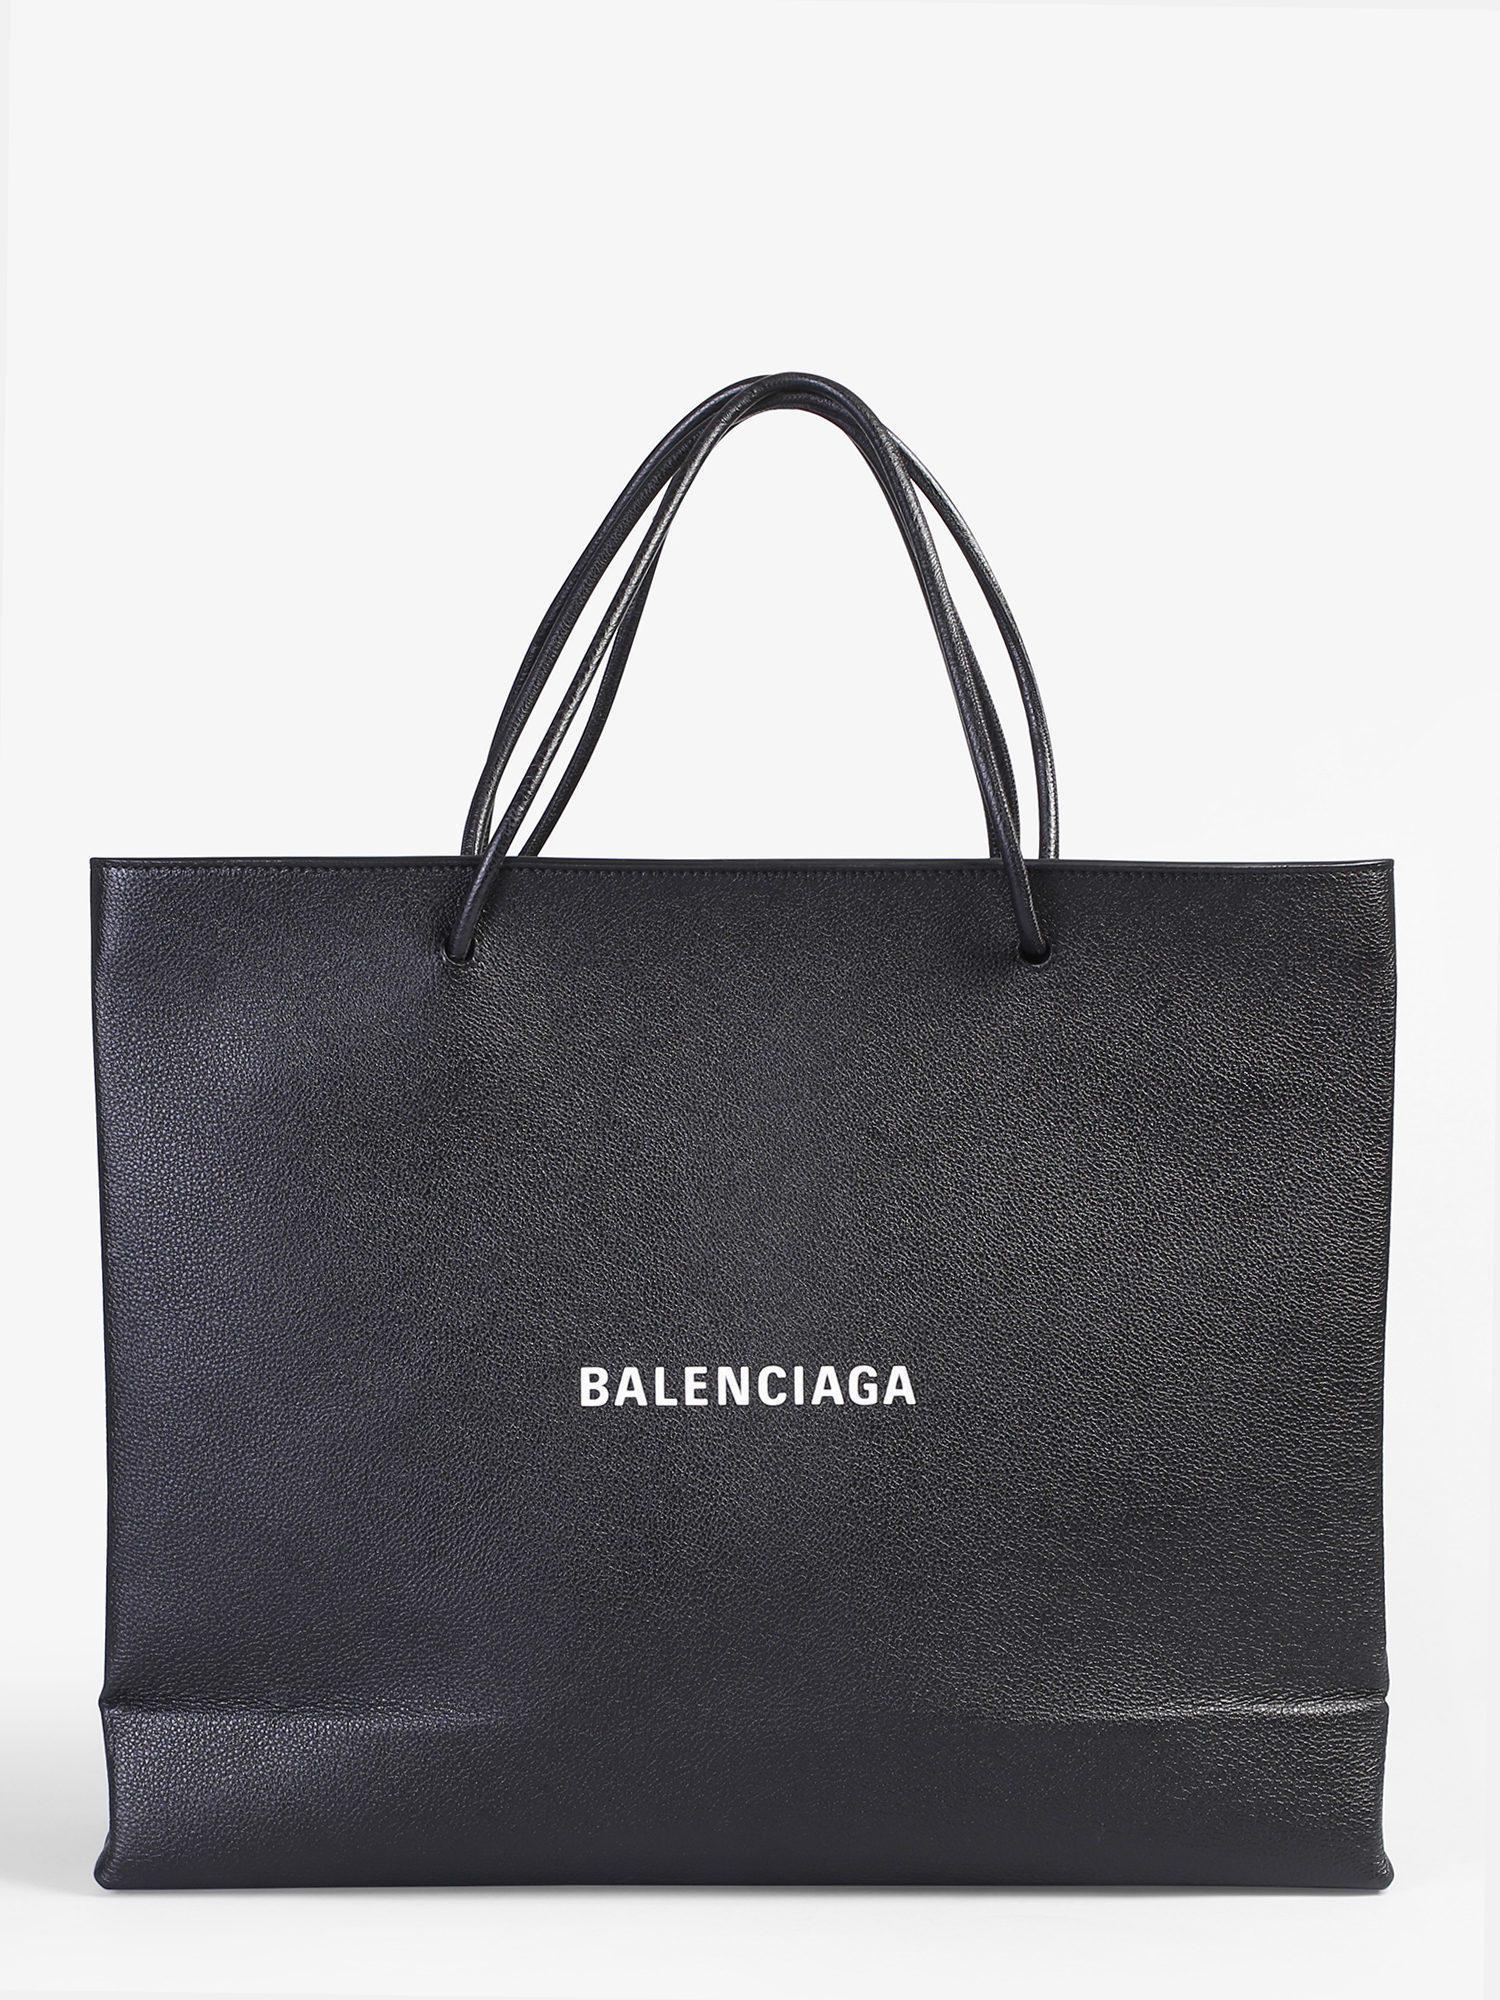 Balenciaga - Black Shopping Leather Bag for Men - Lyst. View fullscreen 9f7abf33a4bb7